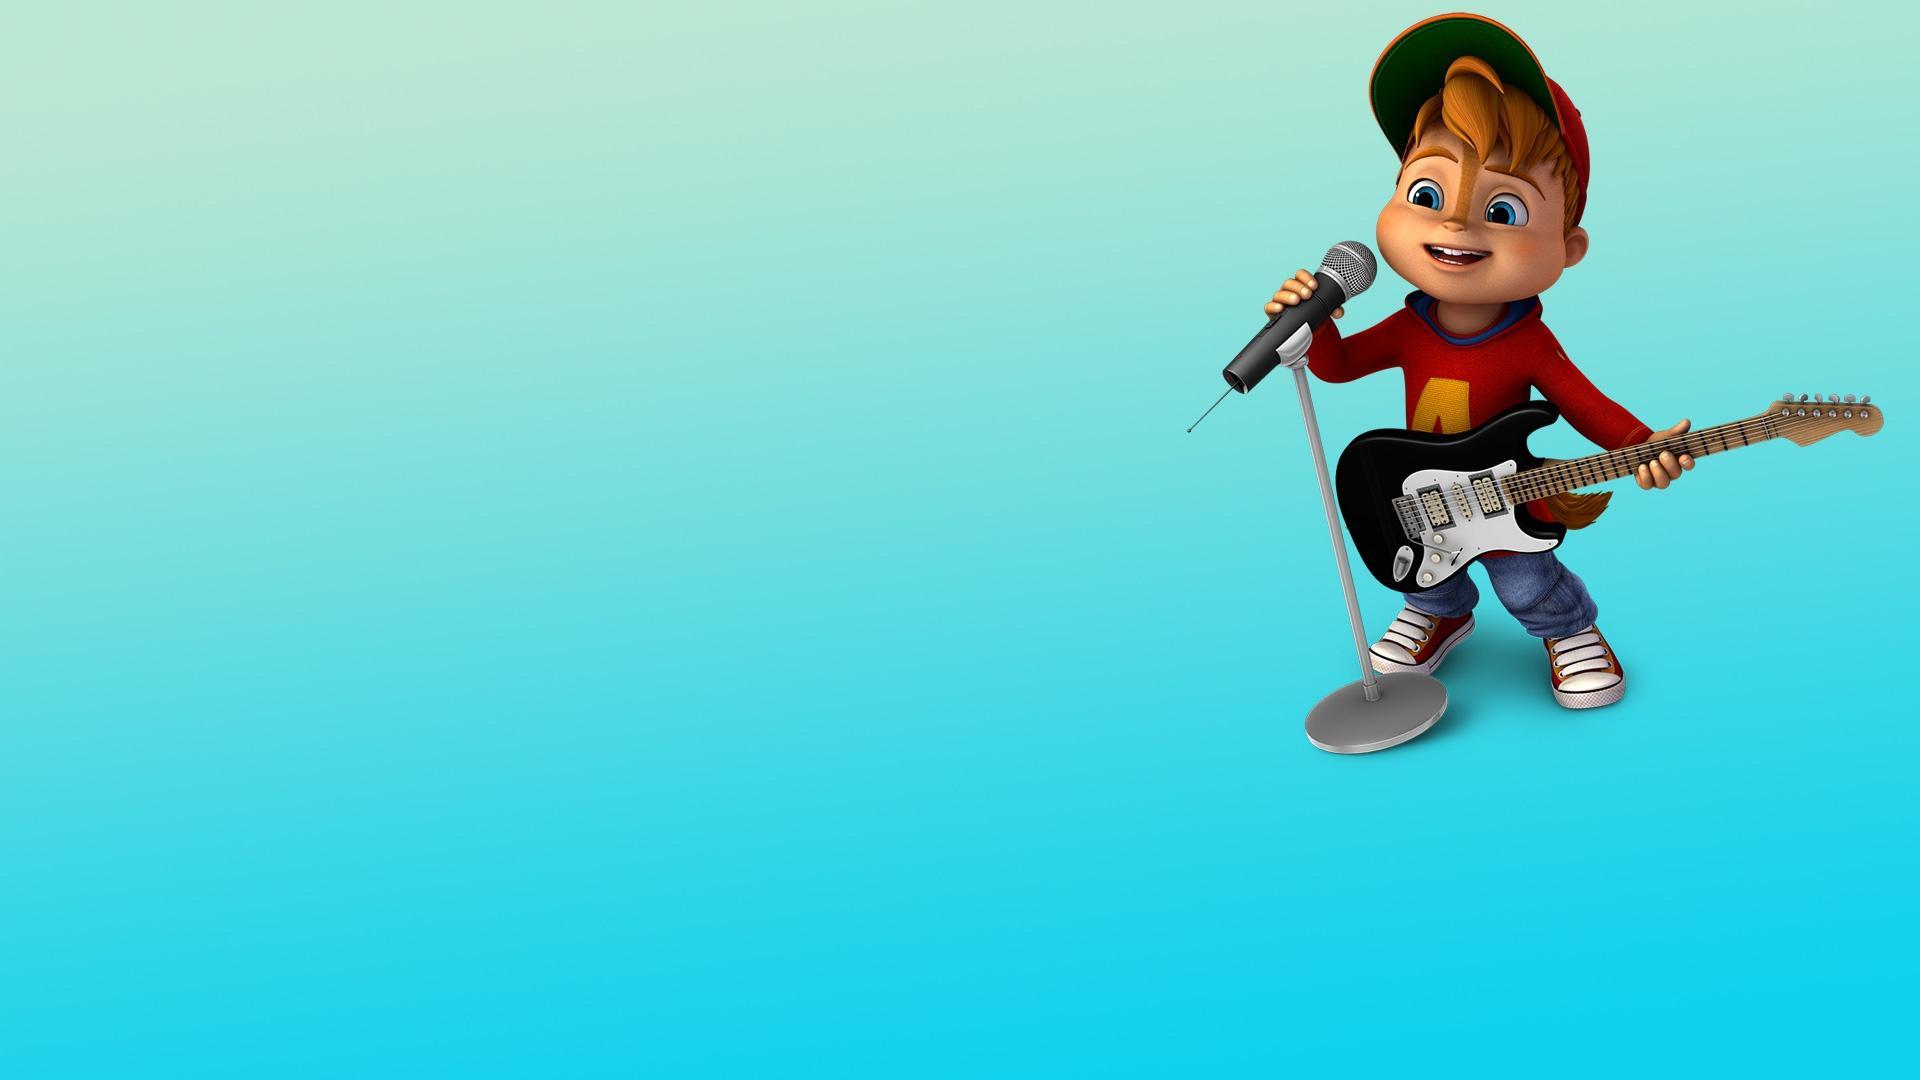 Nickelodeon Alvinnn!!! And the Chipmunks